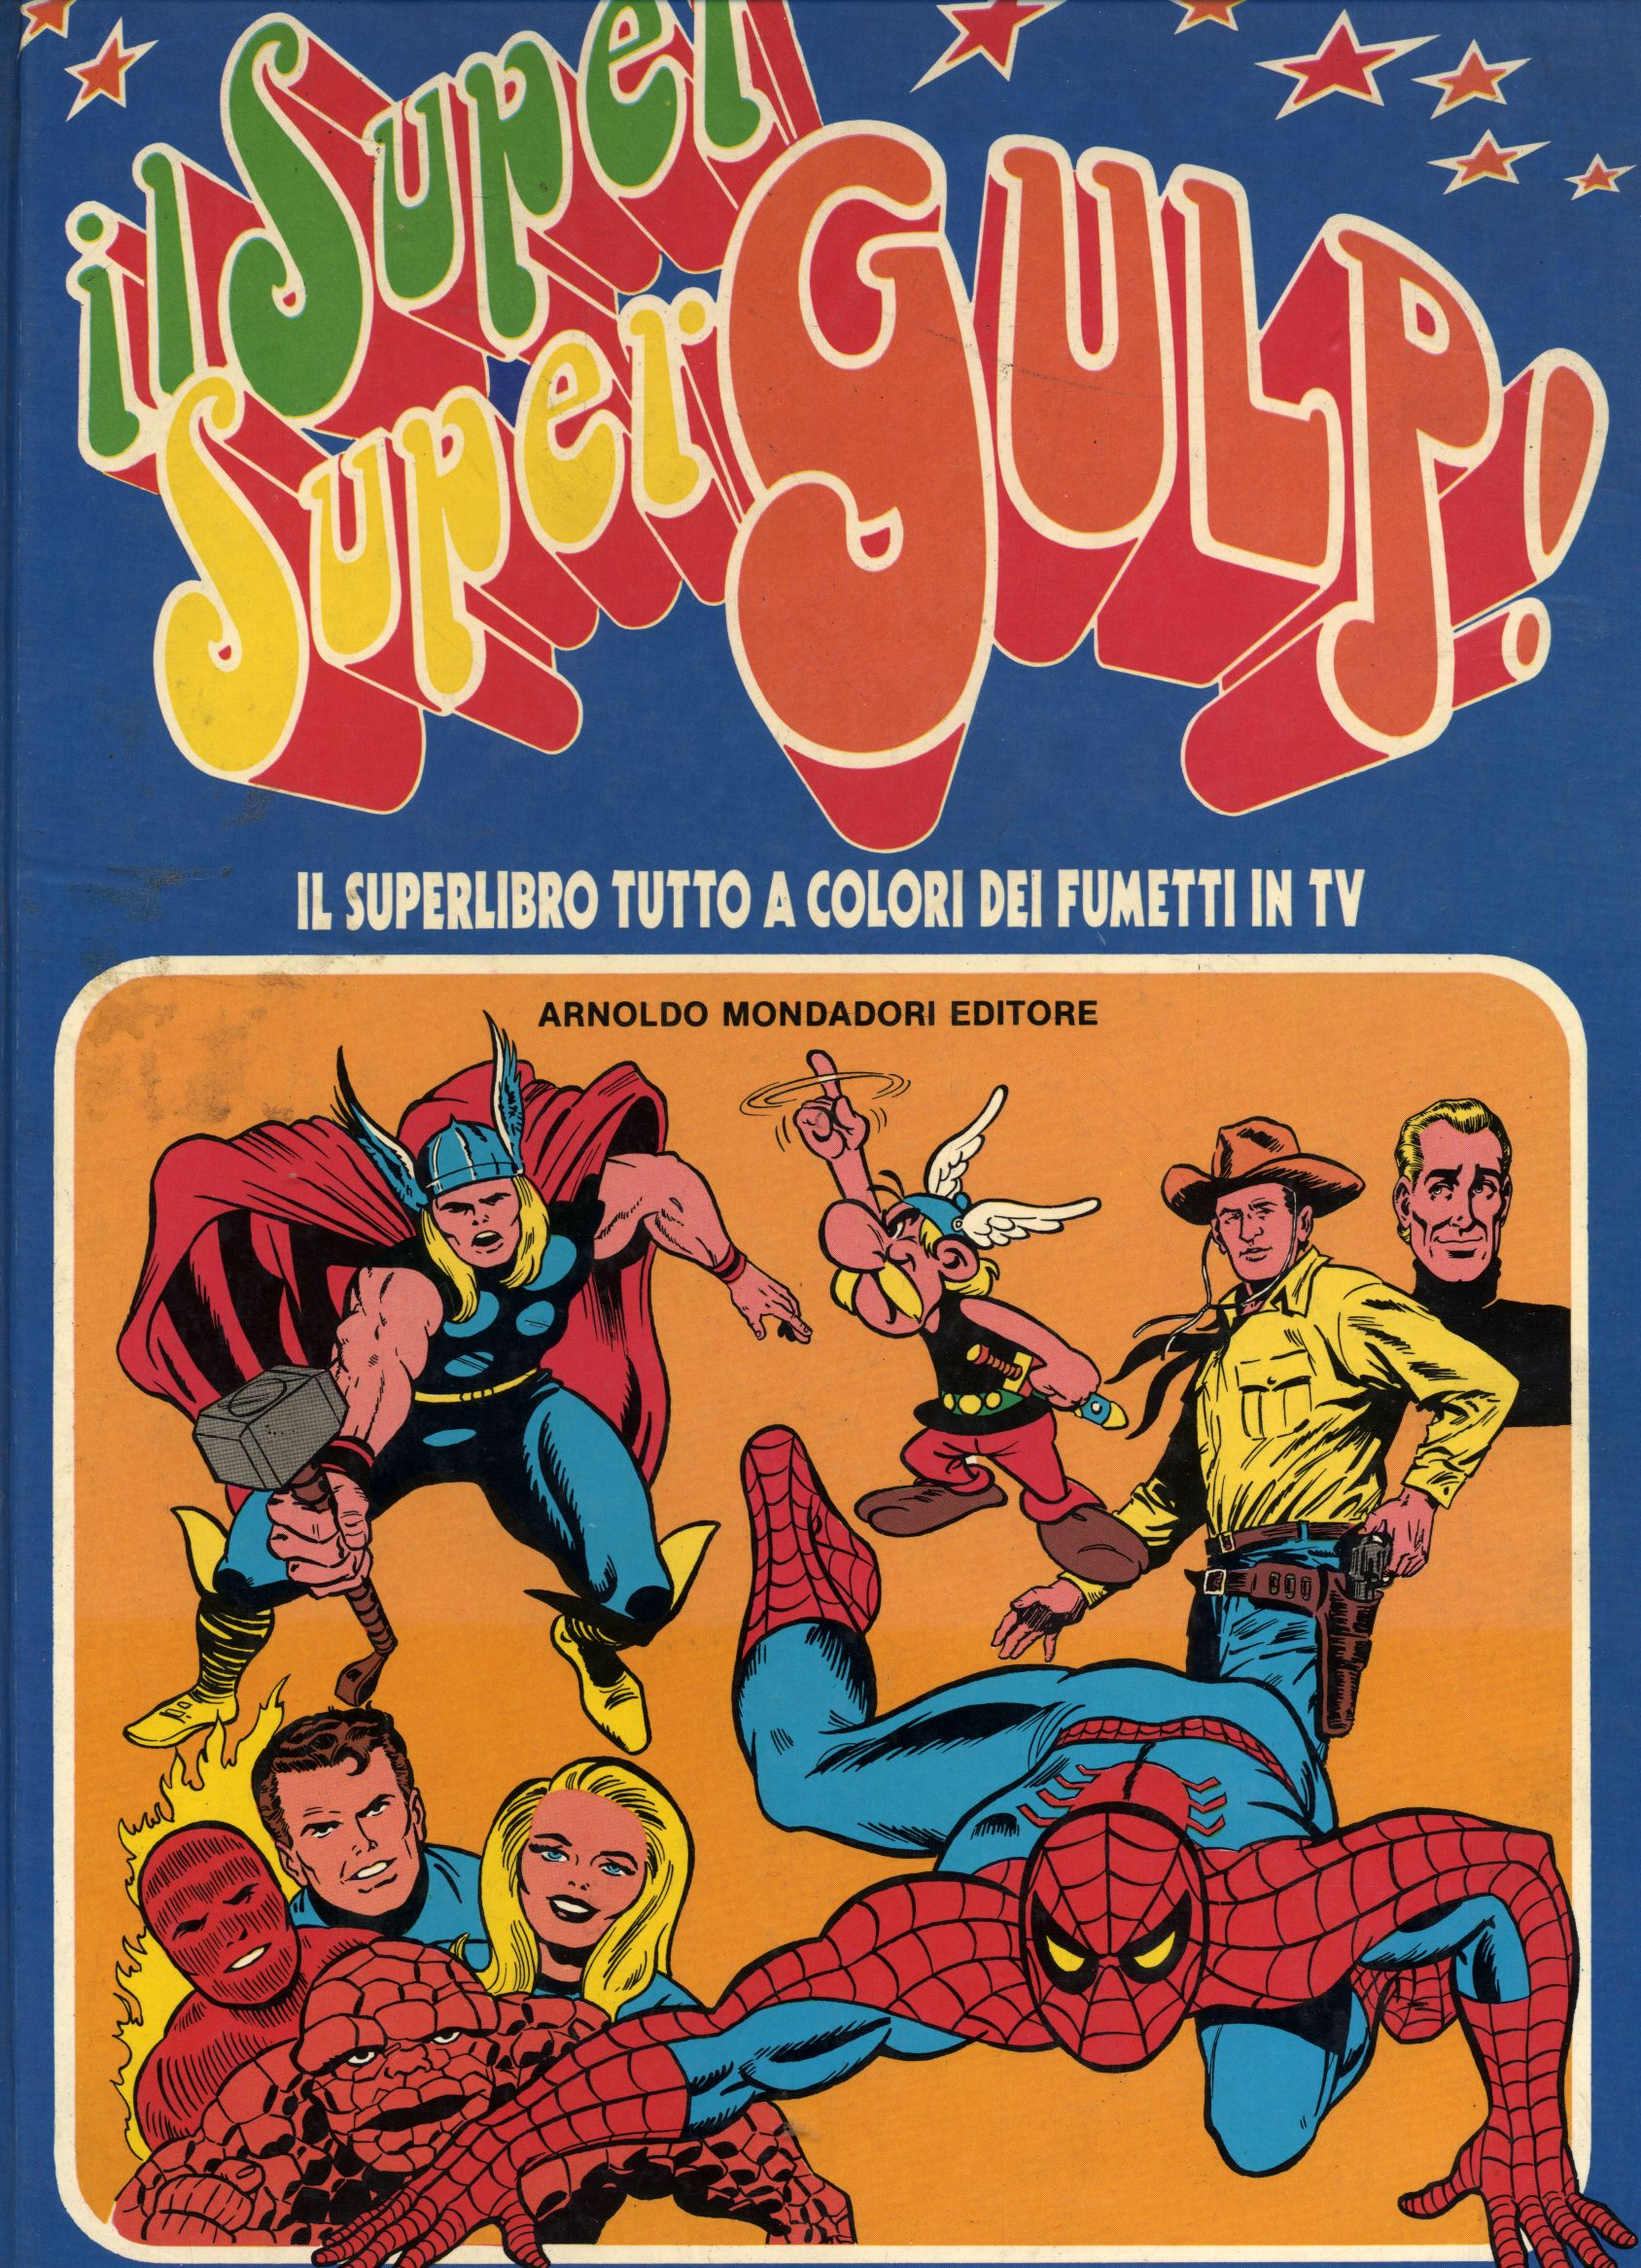 Il Super Super Gulp